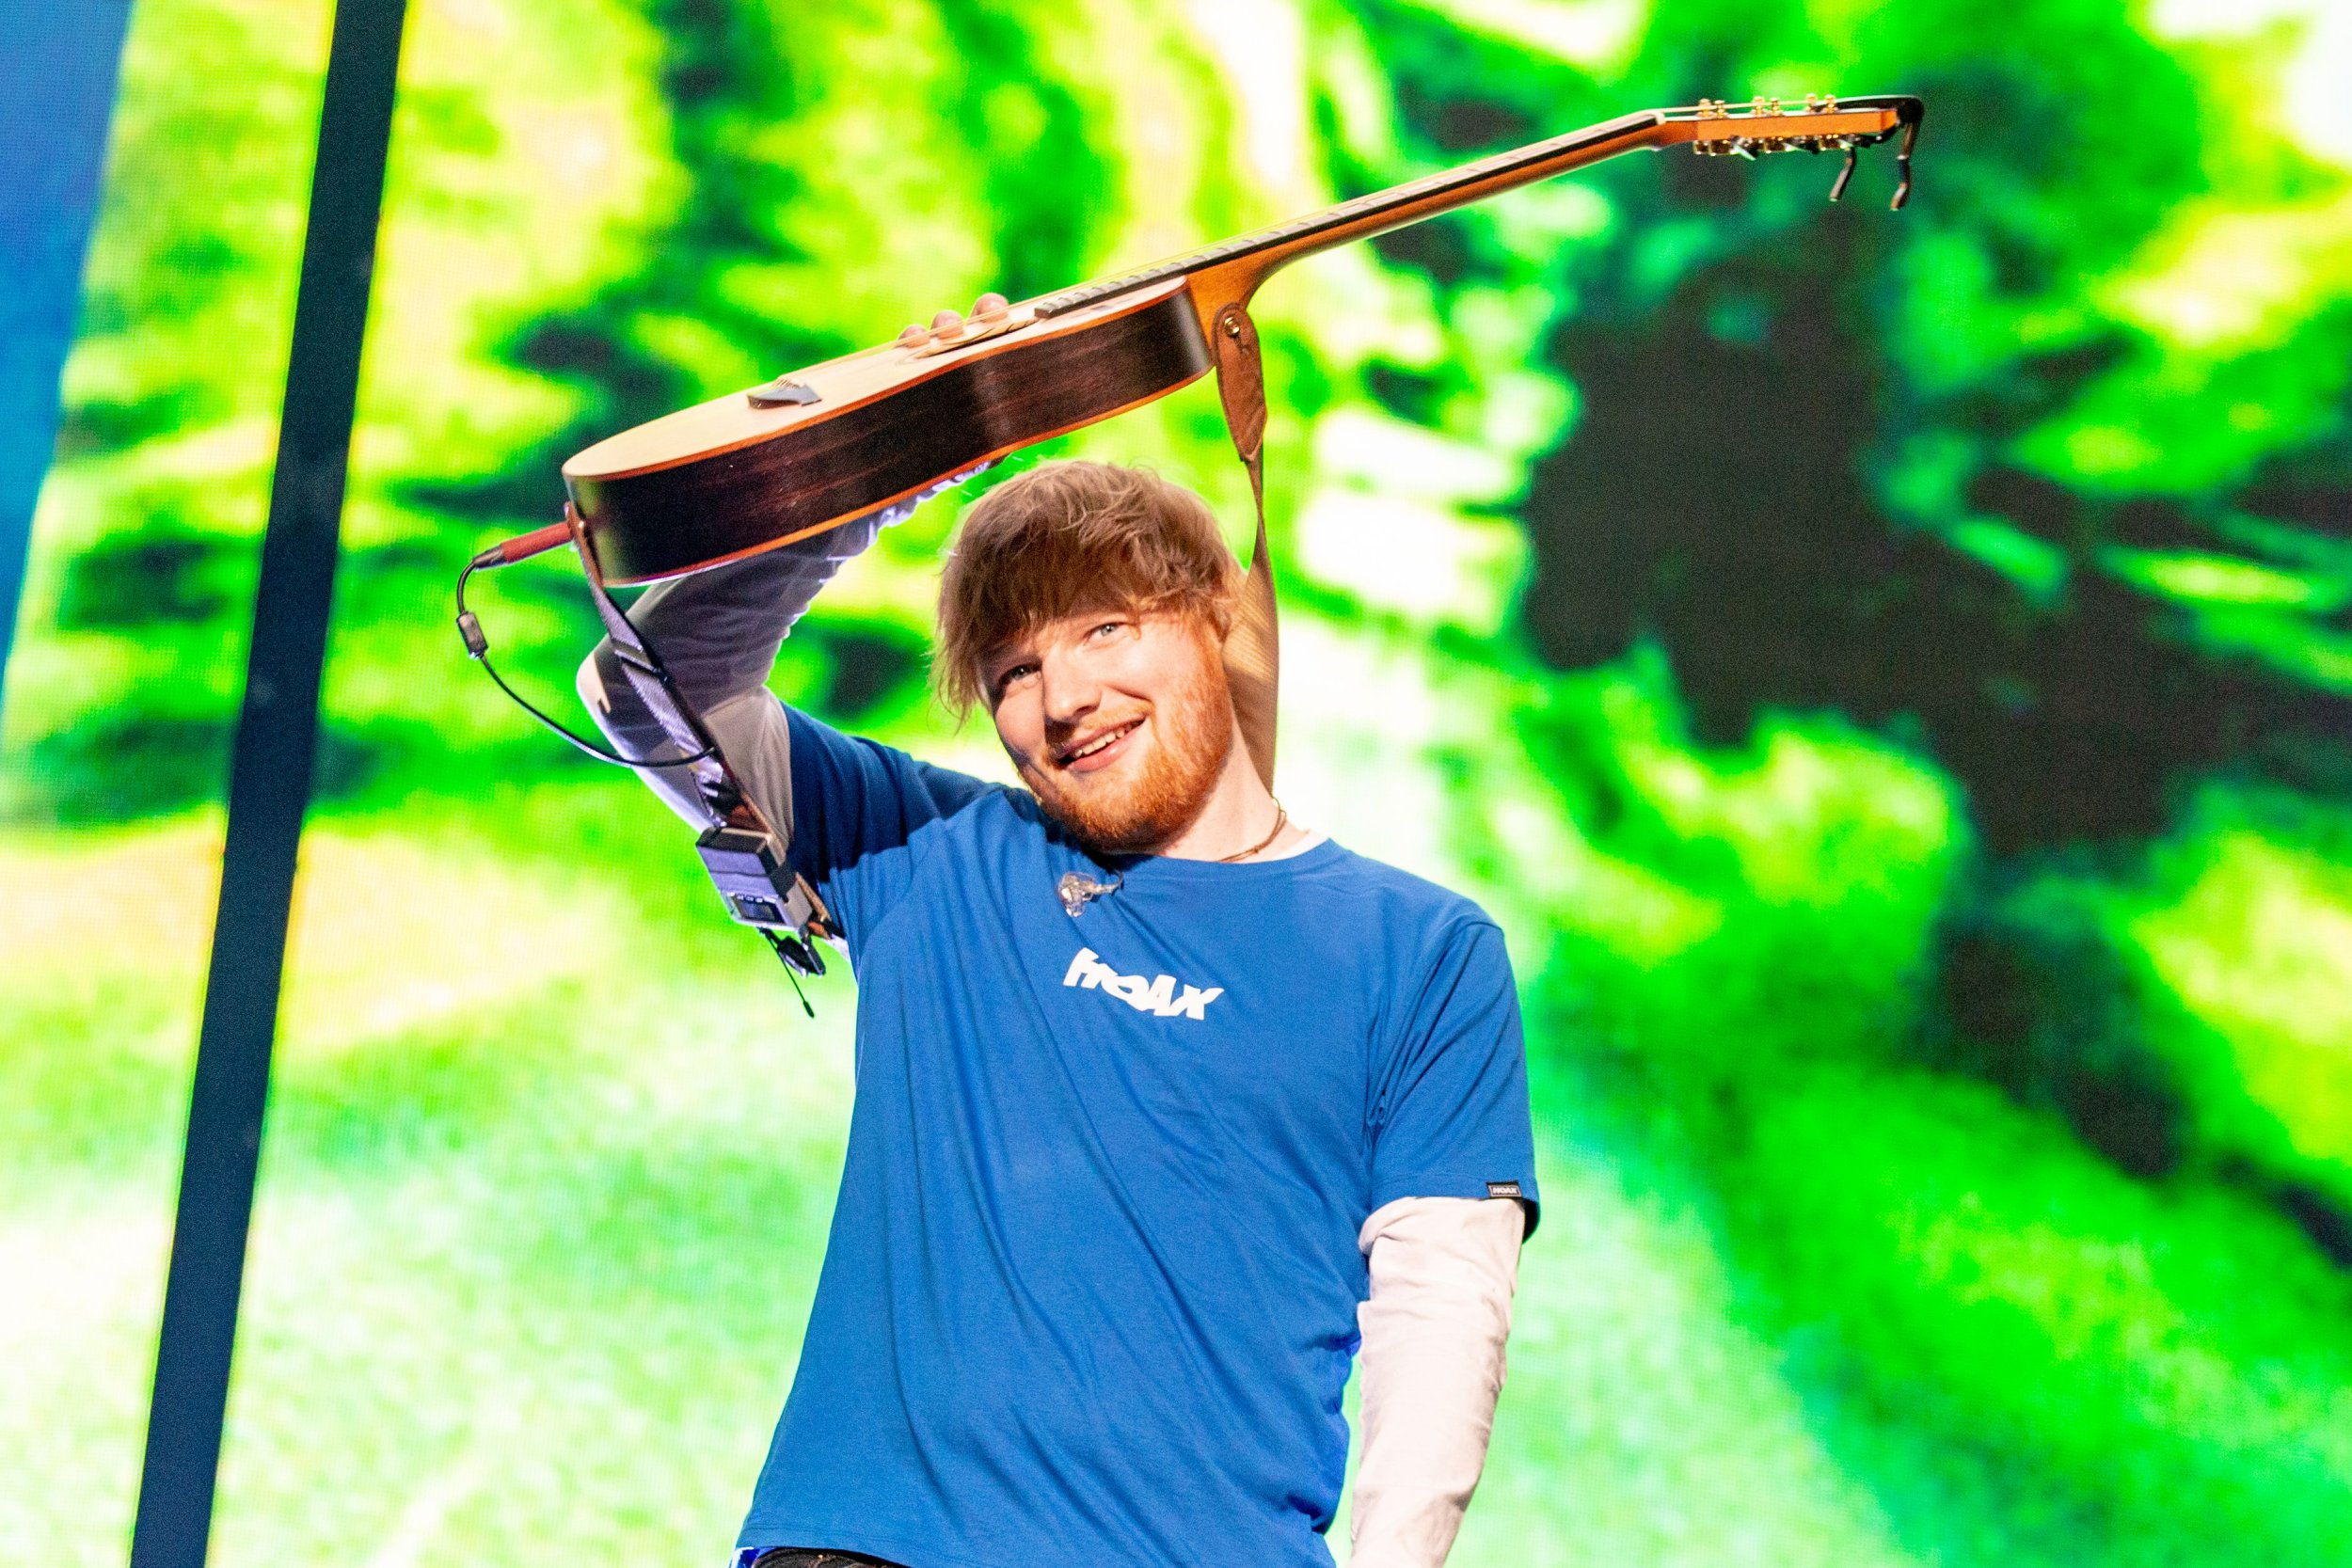 Mandatory Credit: Photo by RMV/REX/Shutterstock (9946526o) Ed Sheeran Ed Sheeran in concert at Miller Park, Milwaukee, USA - 24 Oct 2018